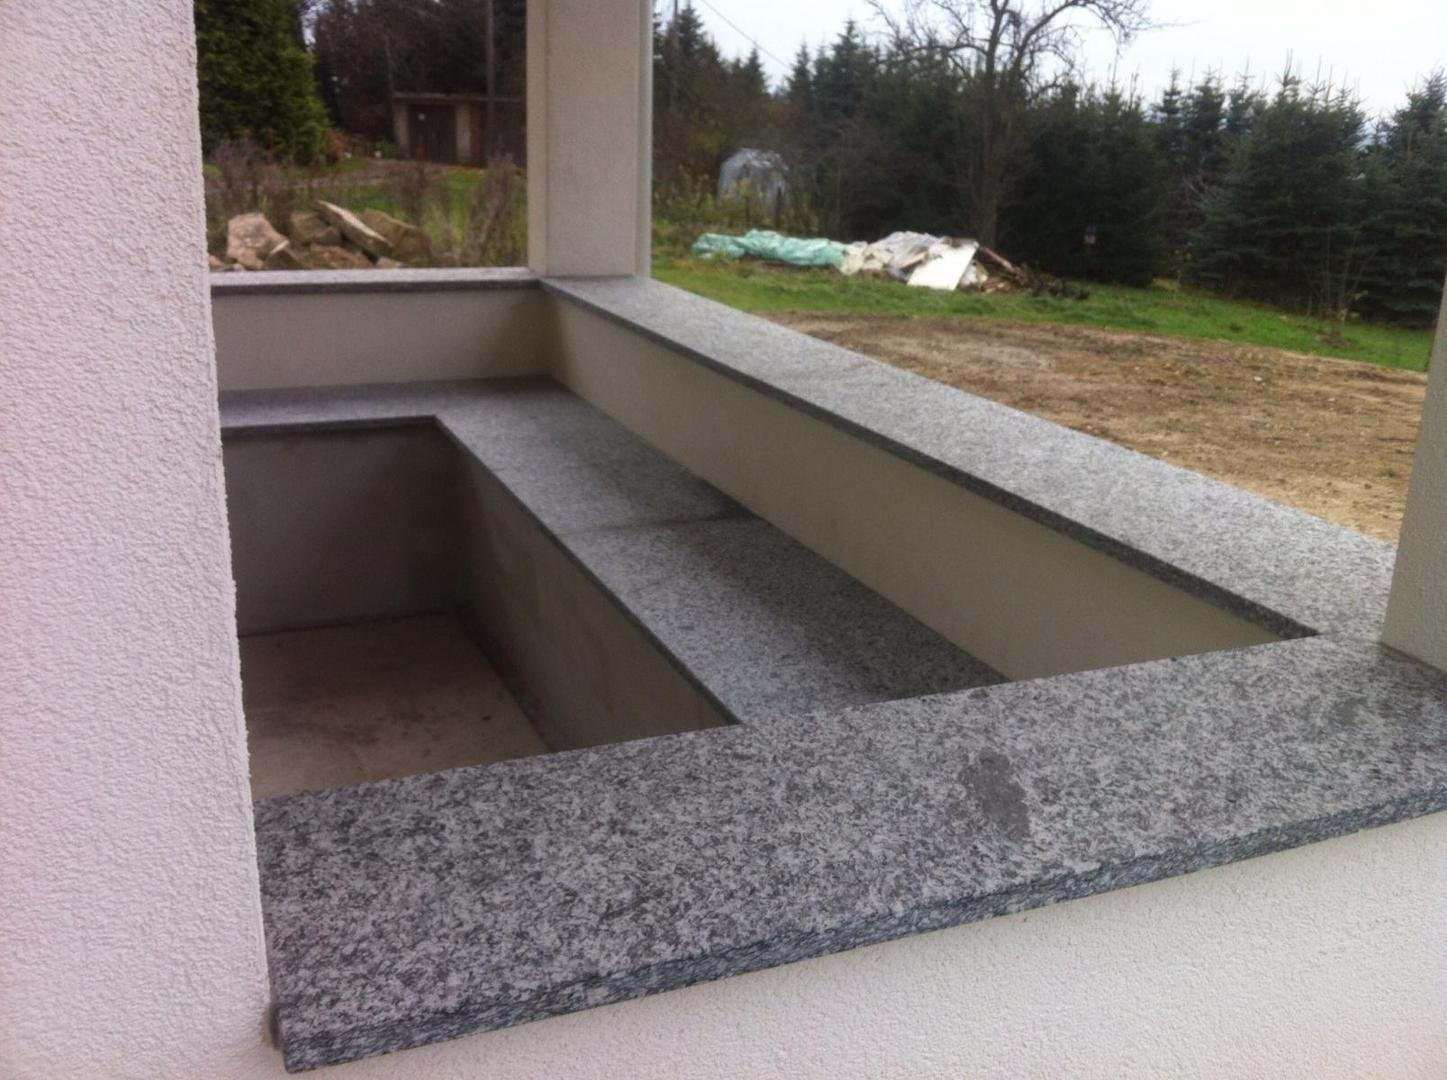 bild abdeckungen sitzb nke in granit serizzo gneis geflammt in ohorn 01896. Black Bedroom Furniture Sets. Home Design Ideas